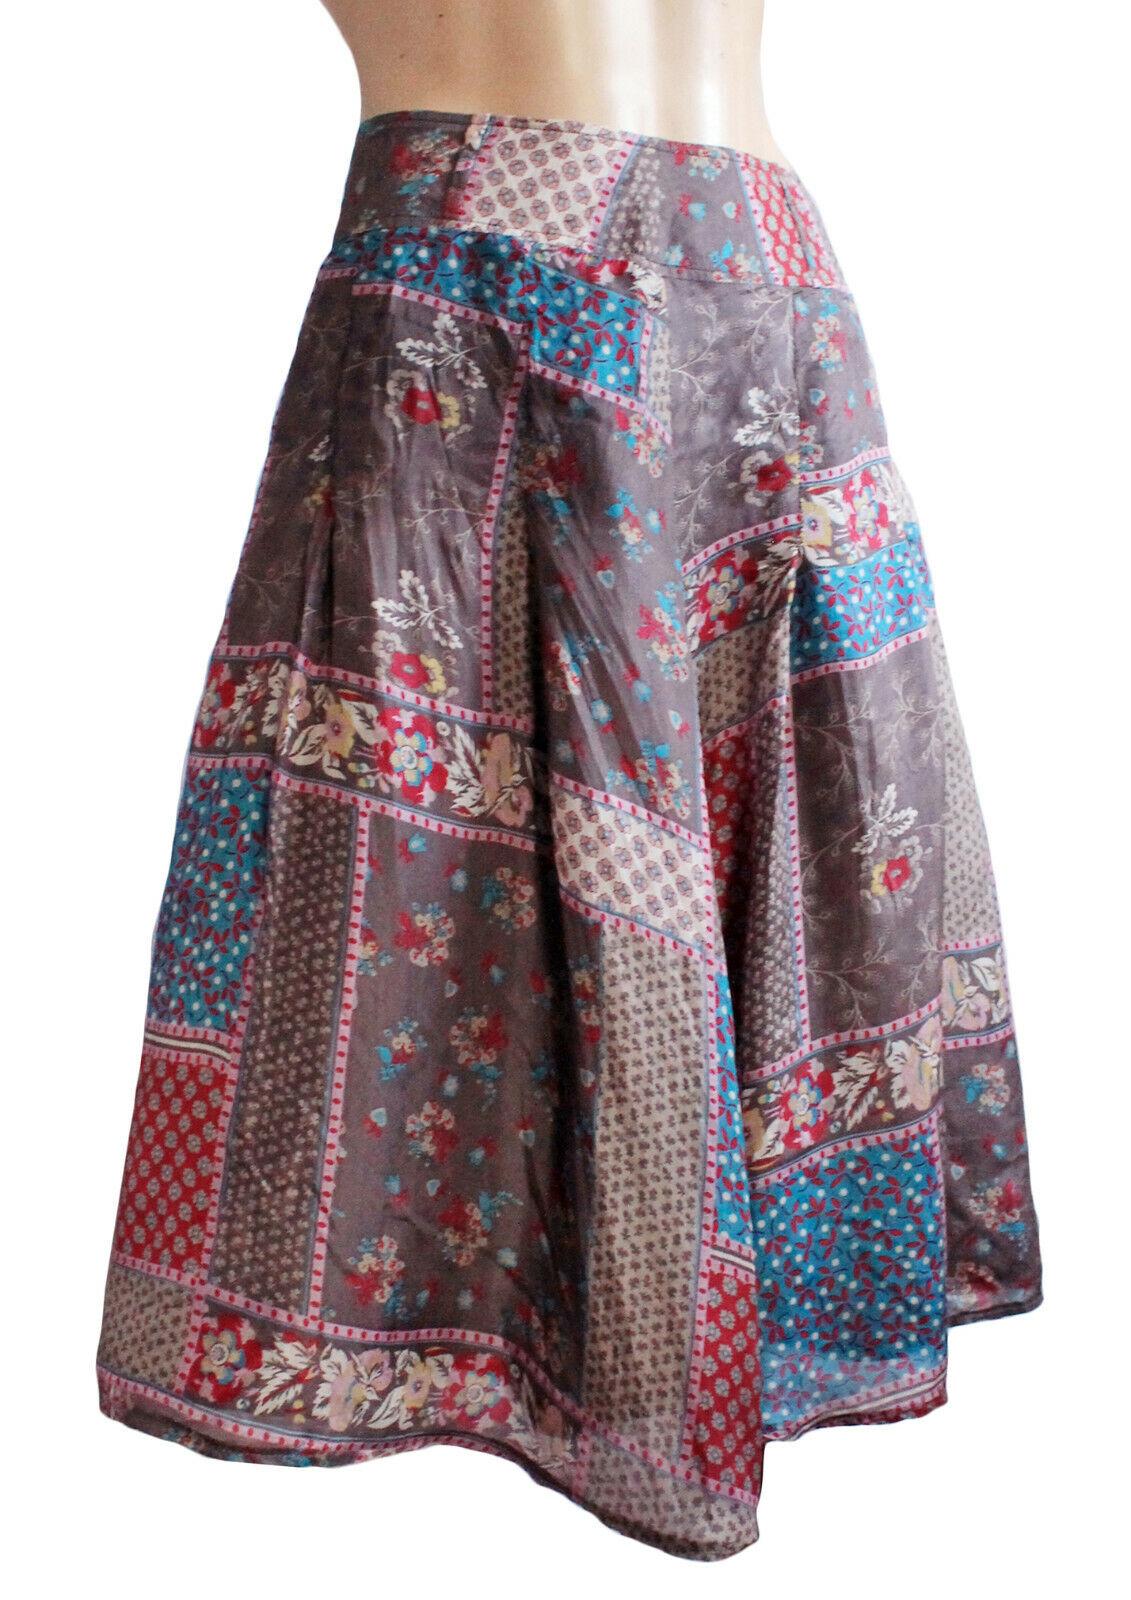 100% Silk Lined Skirt UK Size 16/18 EU 46 Grey Indian Floral 63.5cm